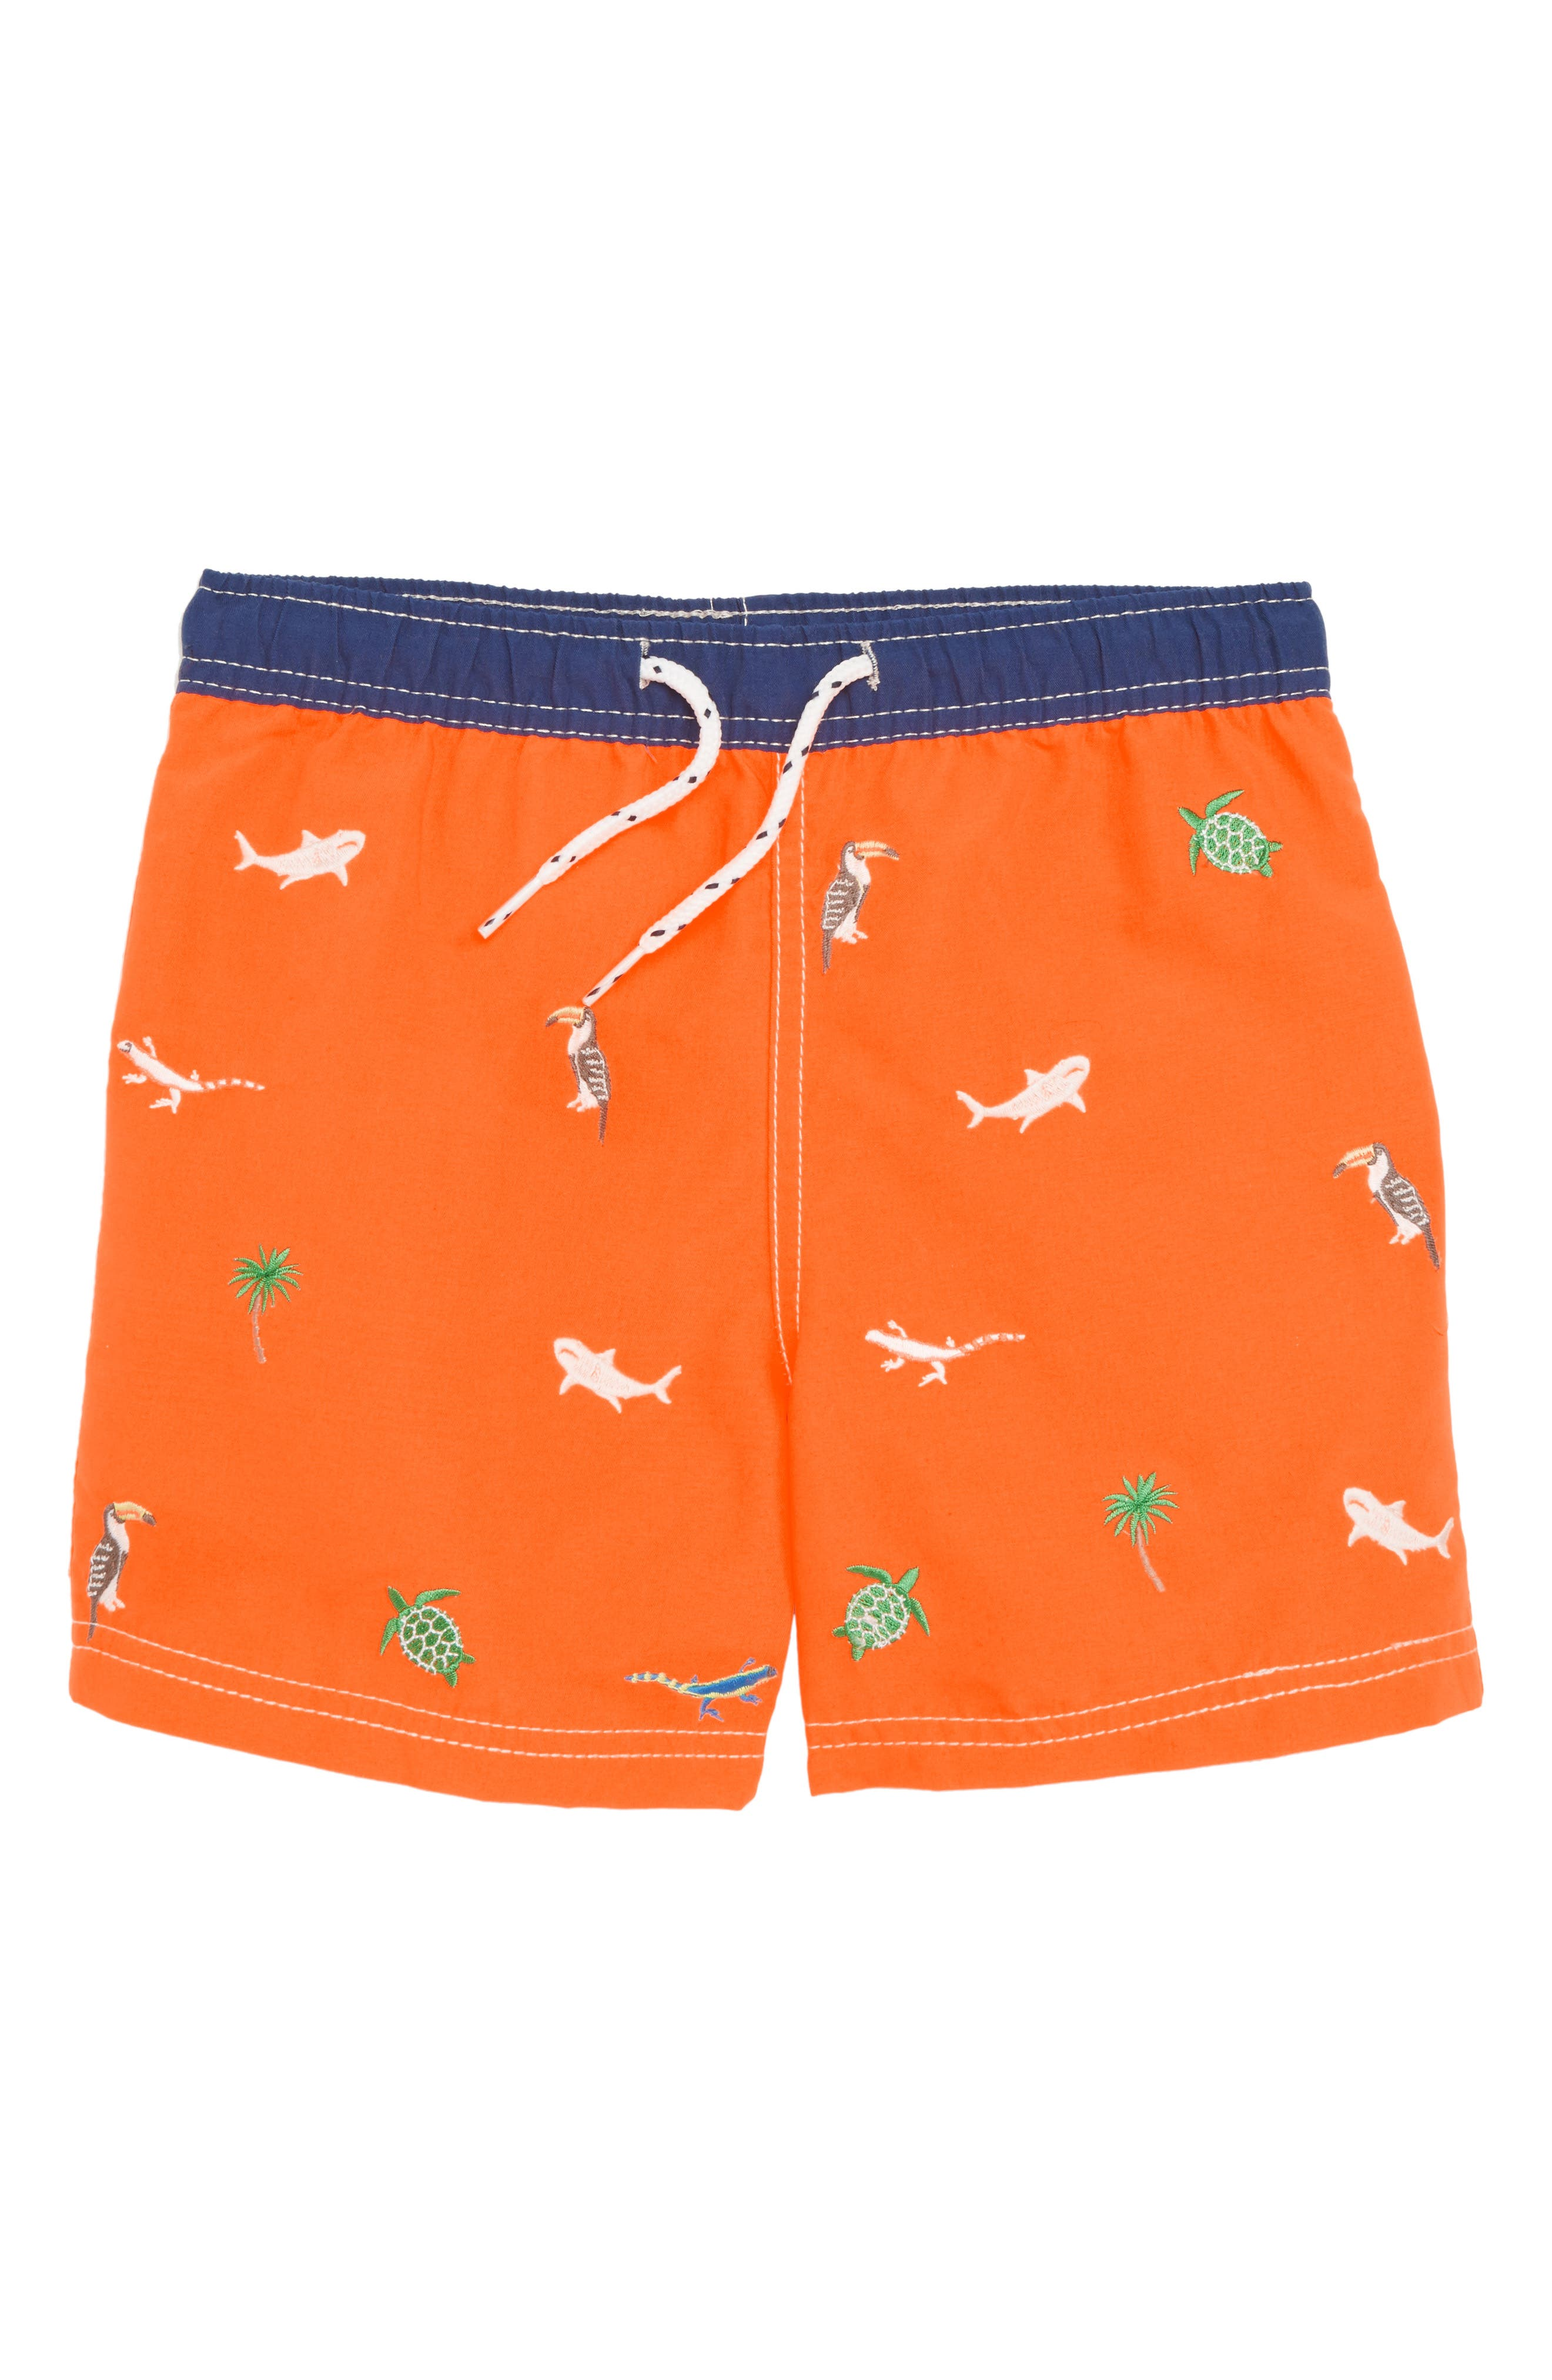 Mini Boden Embroidered Swim Trunks (Toddler Boys, Little Boys & Big Boys)